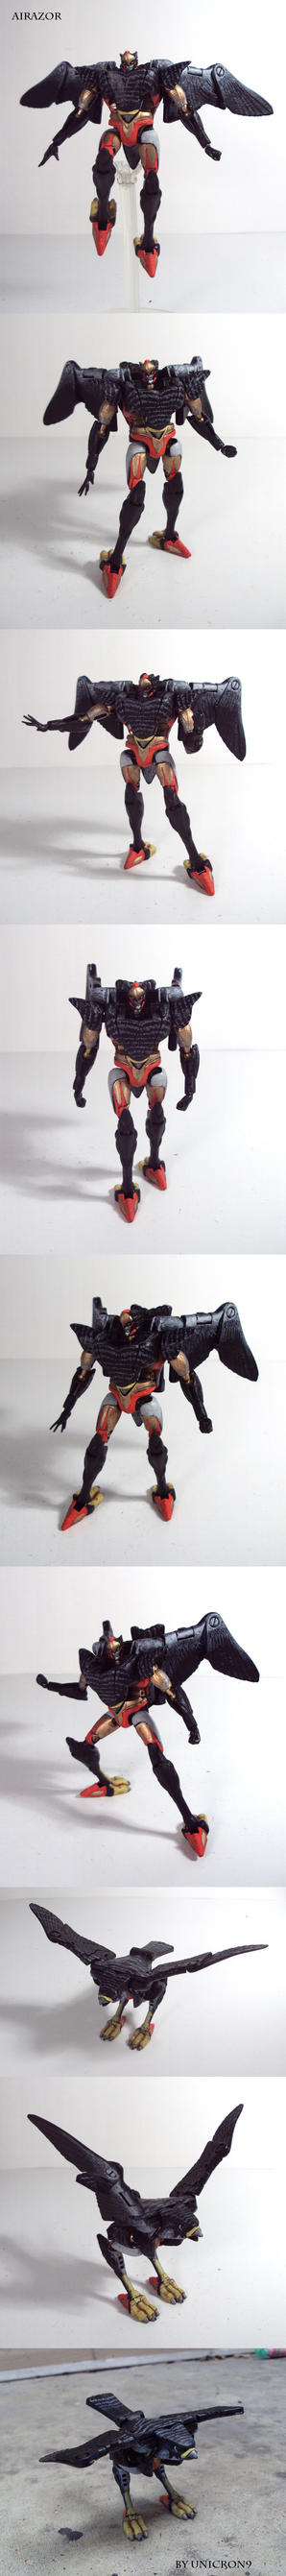 Beast Wars Airazor Custom Figure by Unicron9